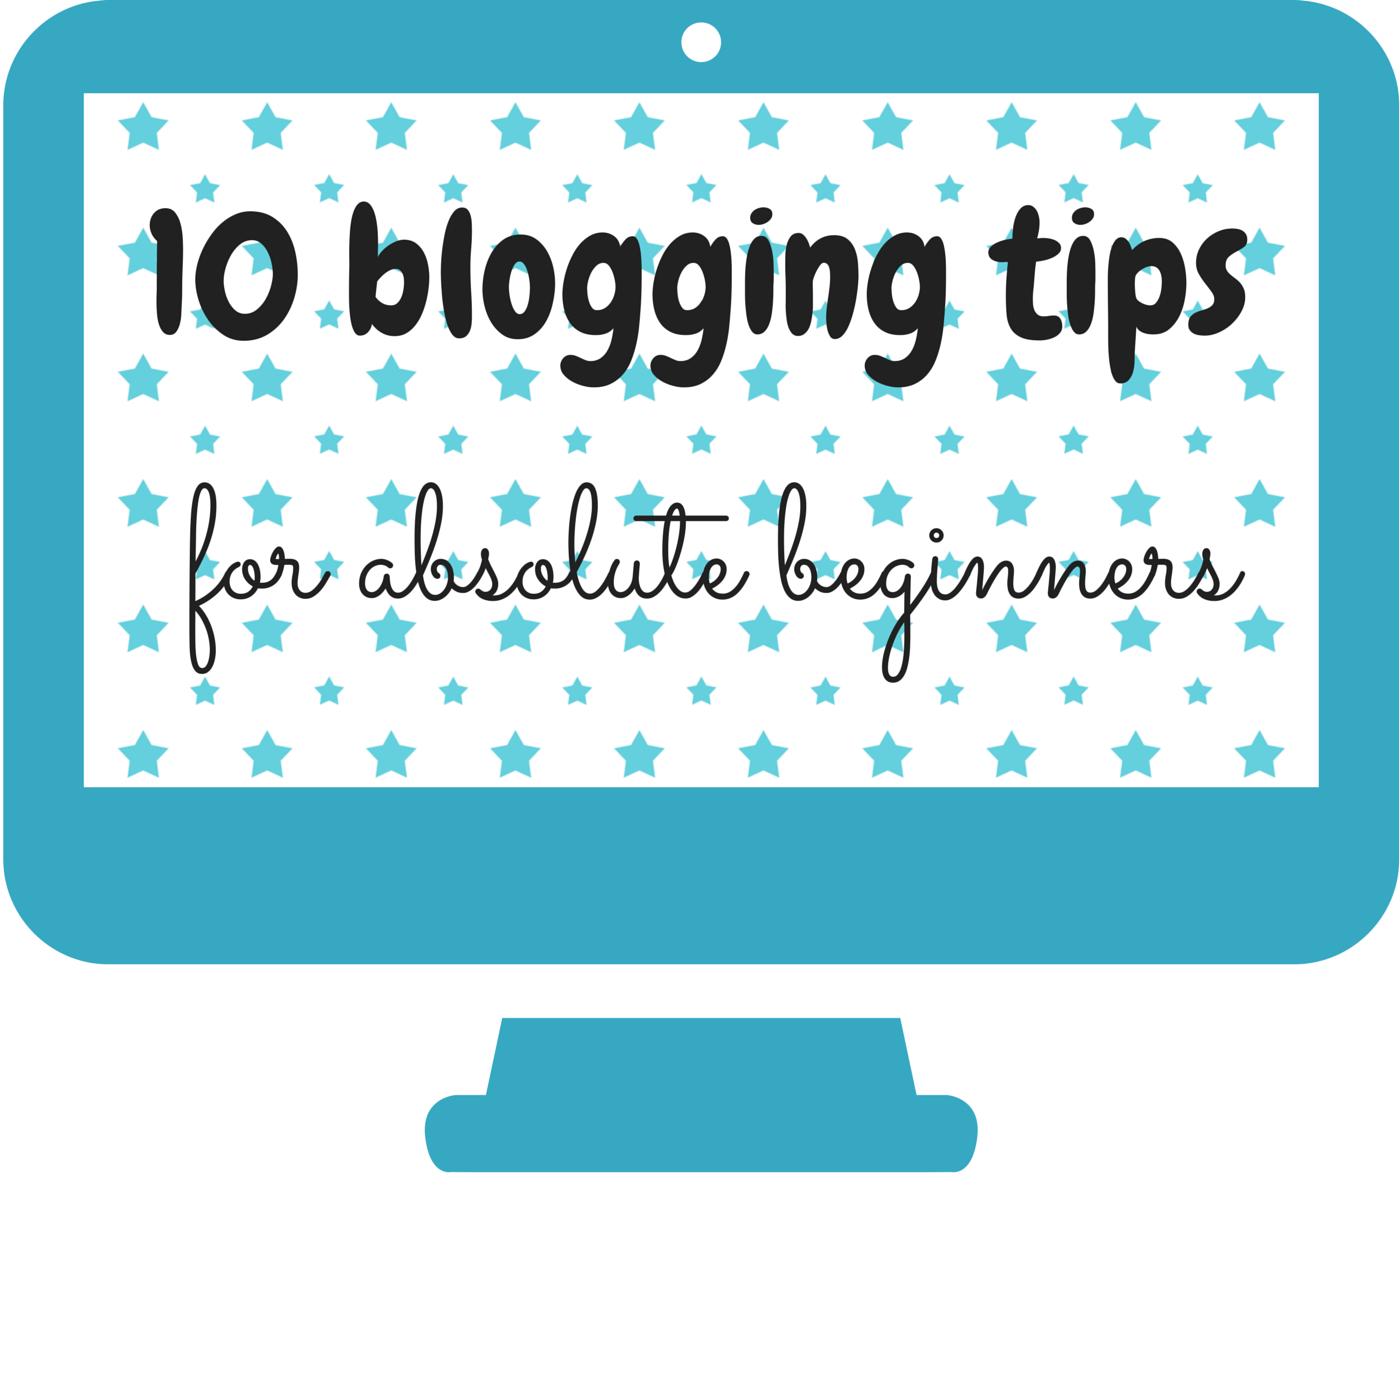 blogging tips, blog tips, 10 blogging tips for beginners